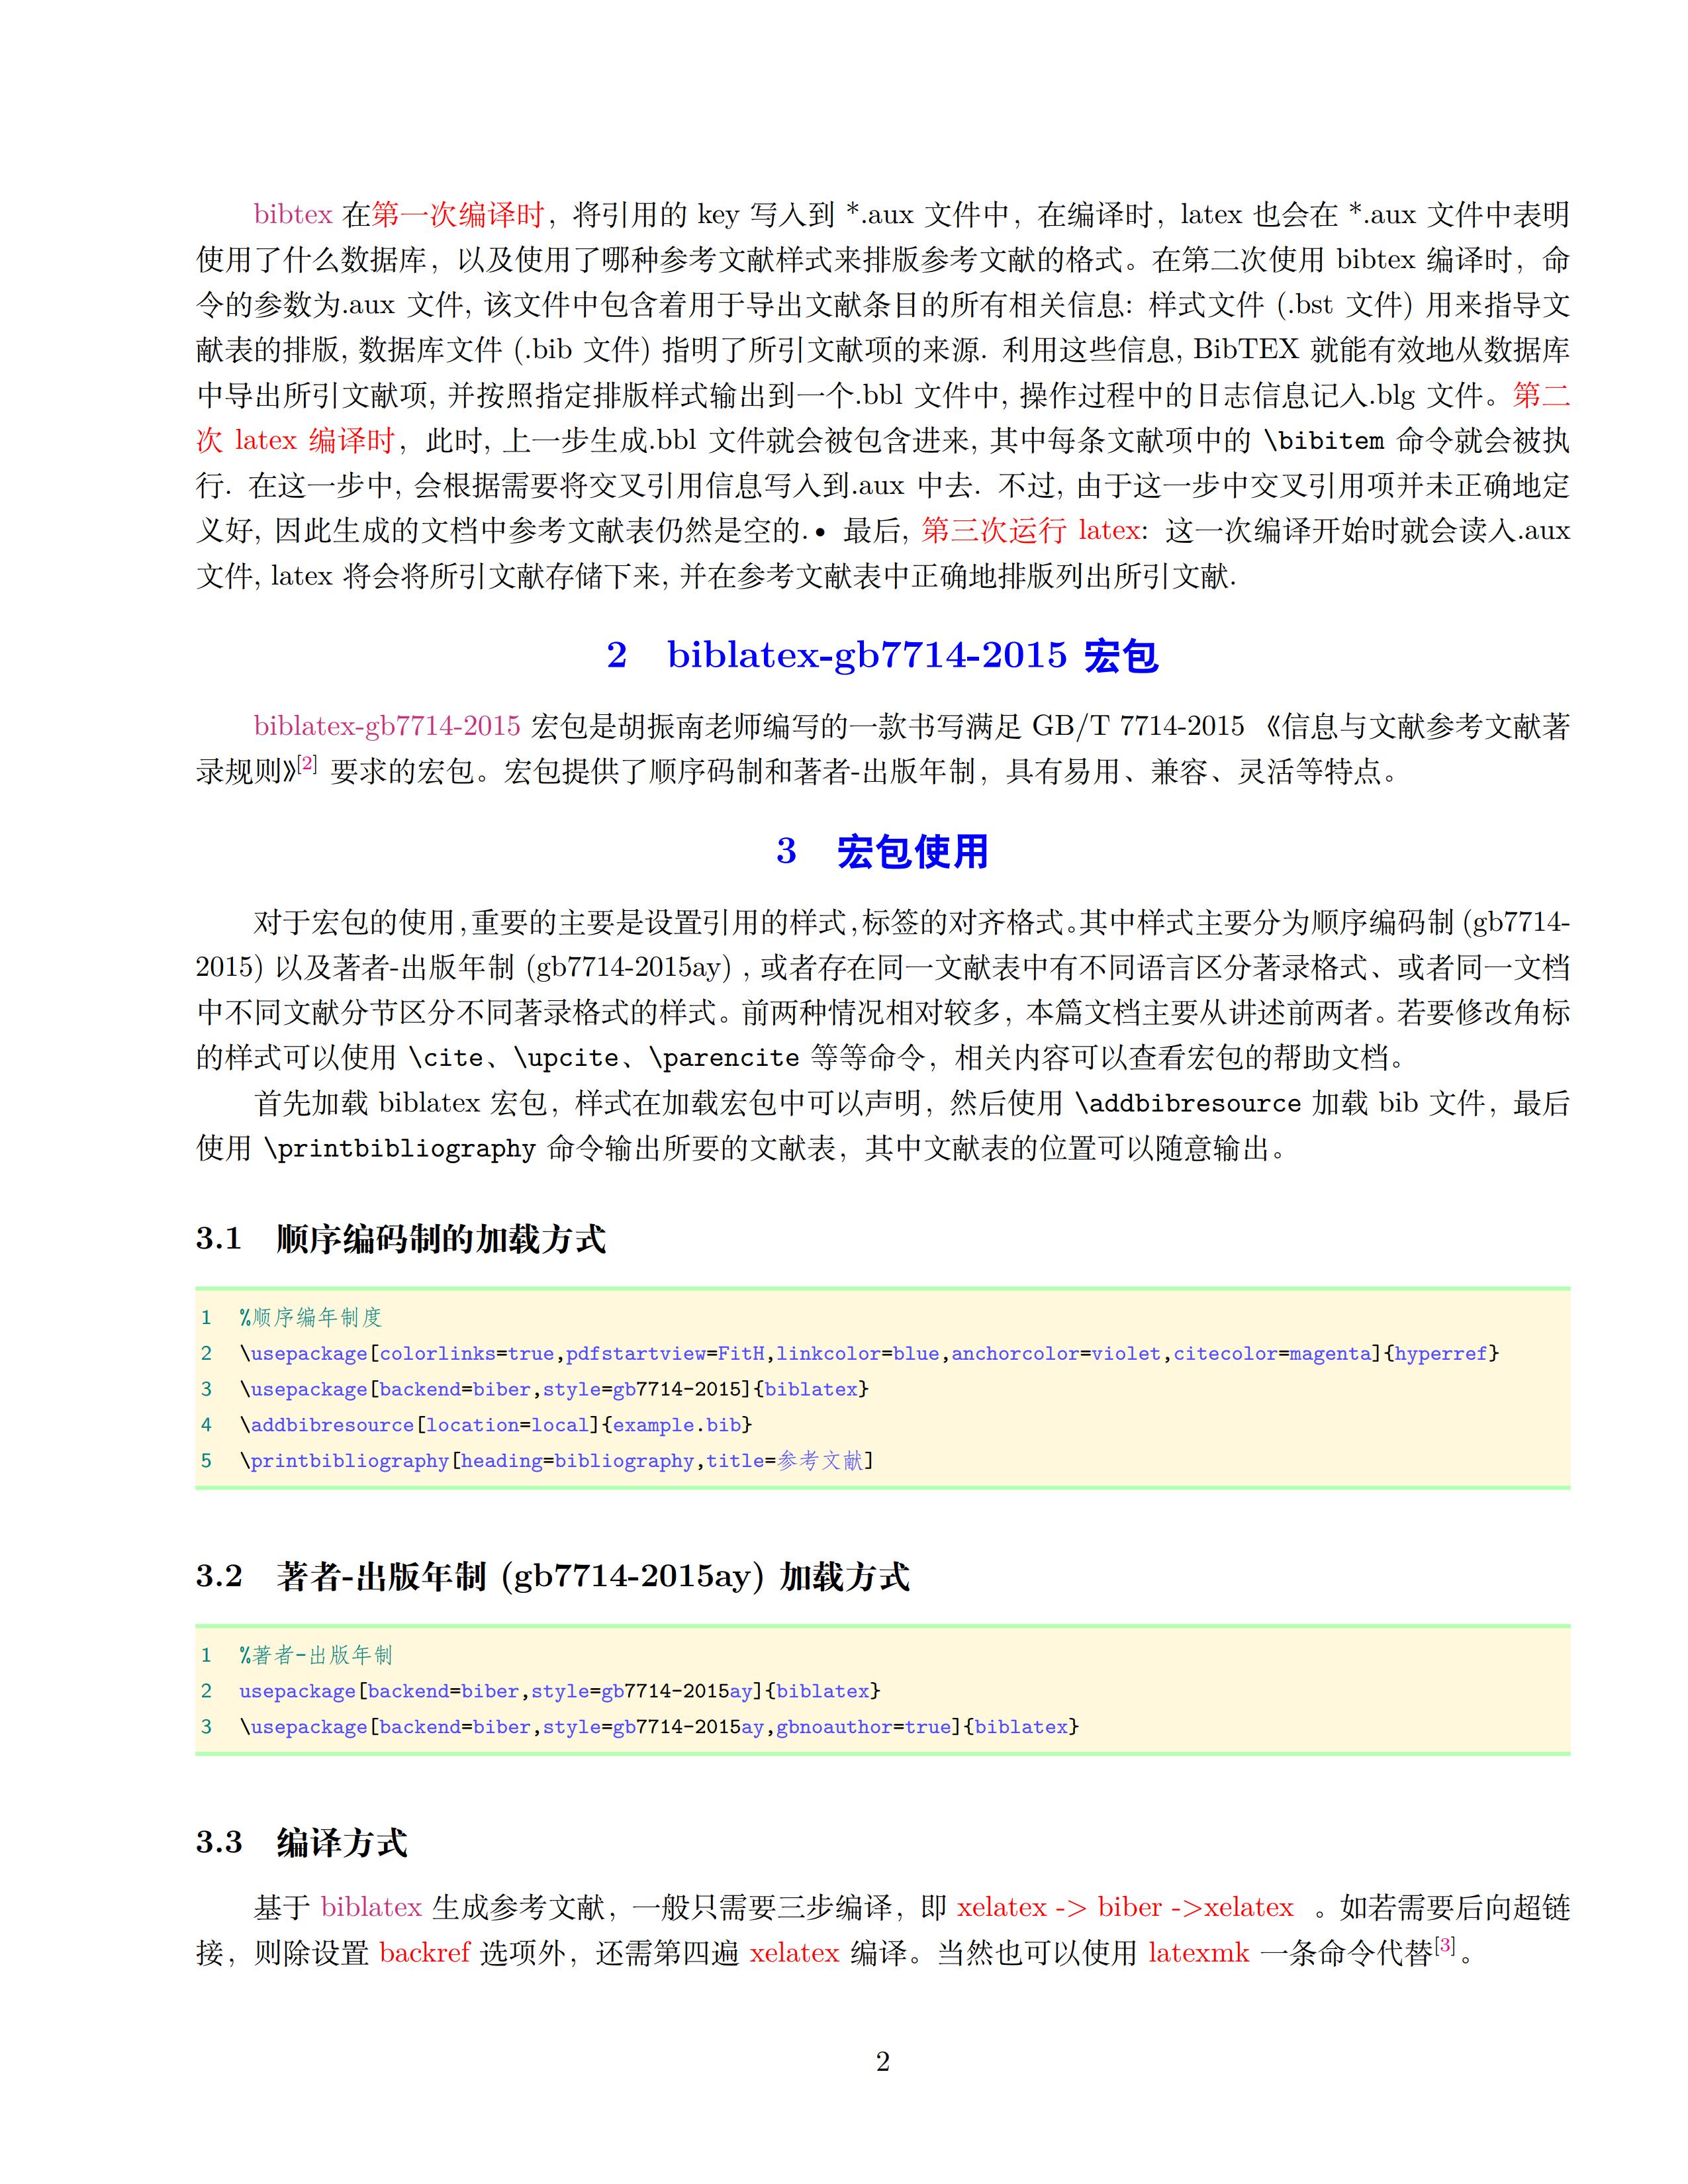 biblatex-gbt7714-2015 与 gbt7714 宏包使用 - 含视频